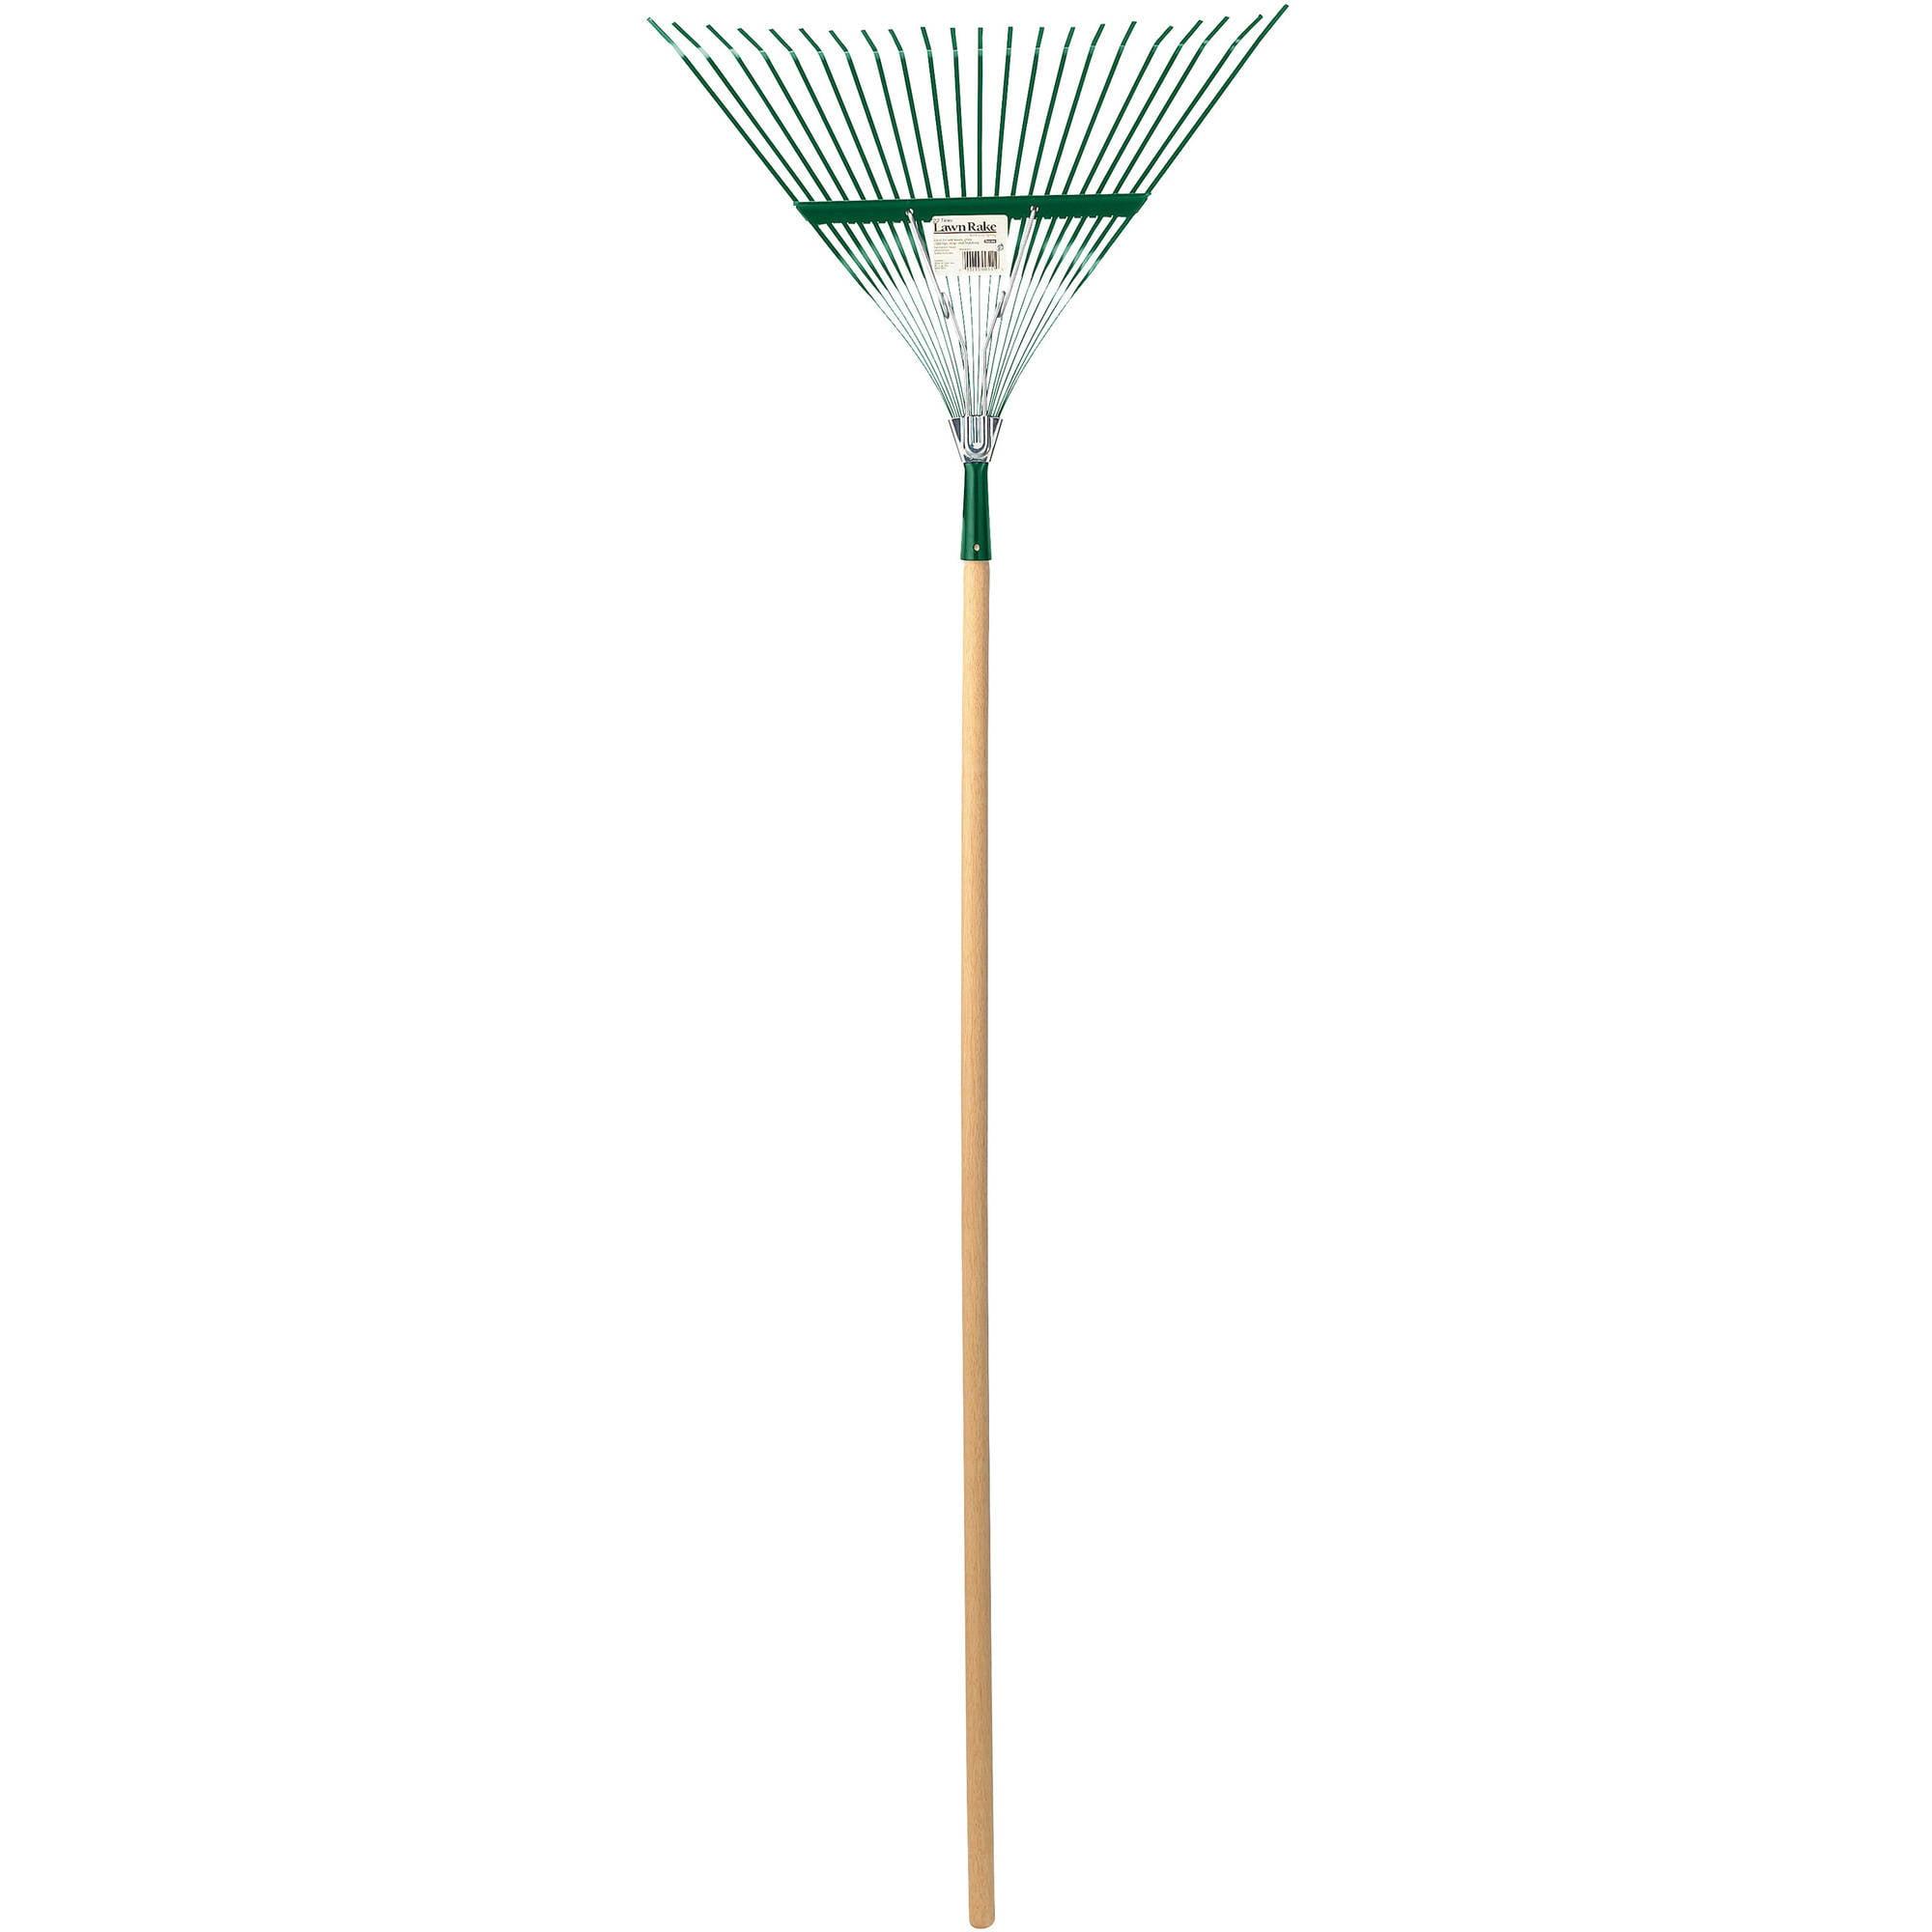 "Gardex 22 Tine Steel Coil-Spring Leaf/Lawn Rake with 48"" Wood Handle"